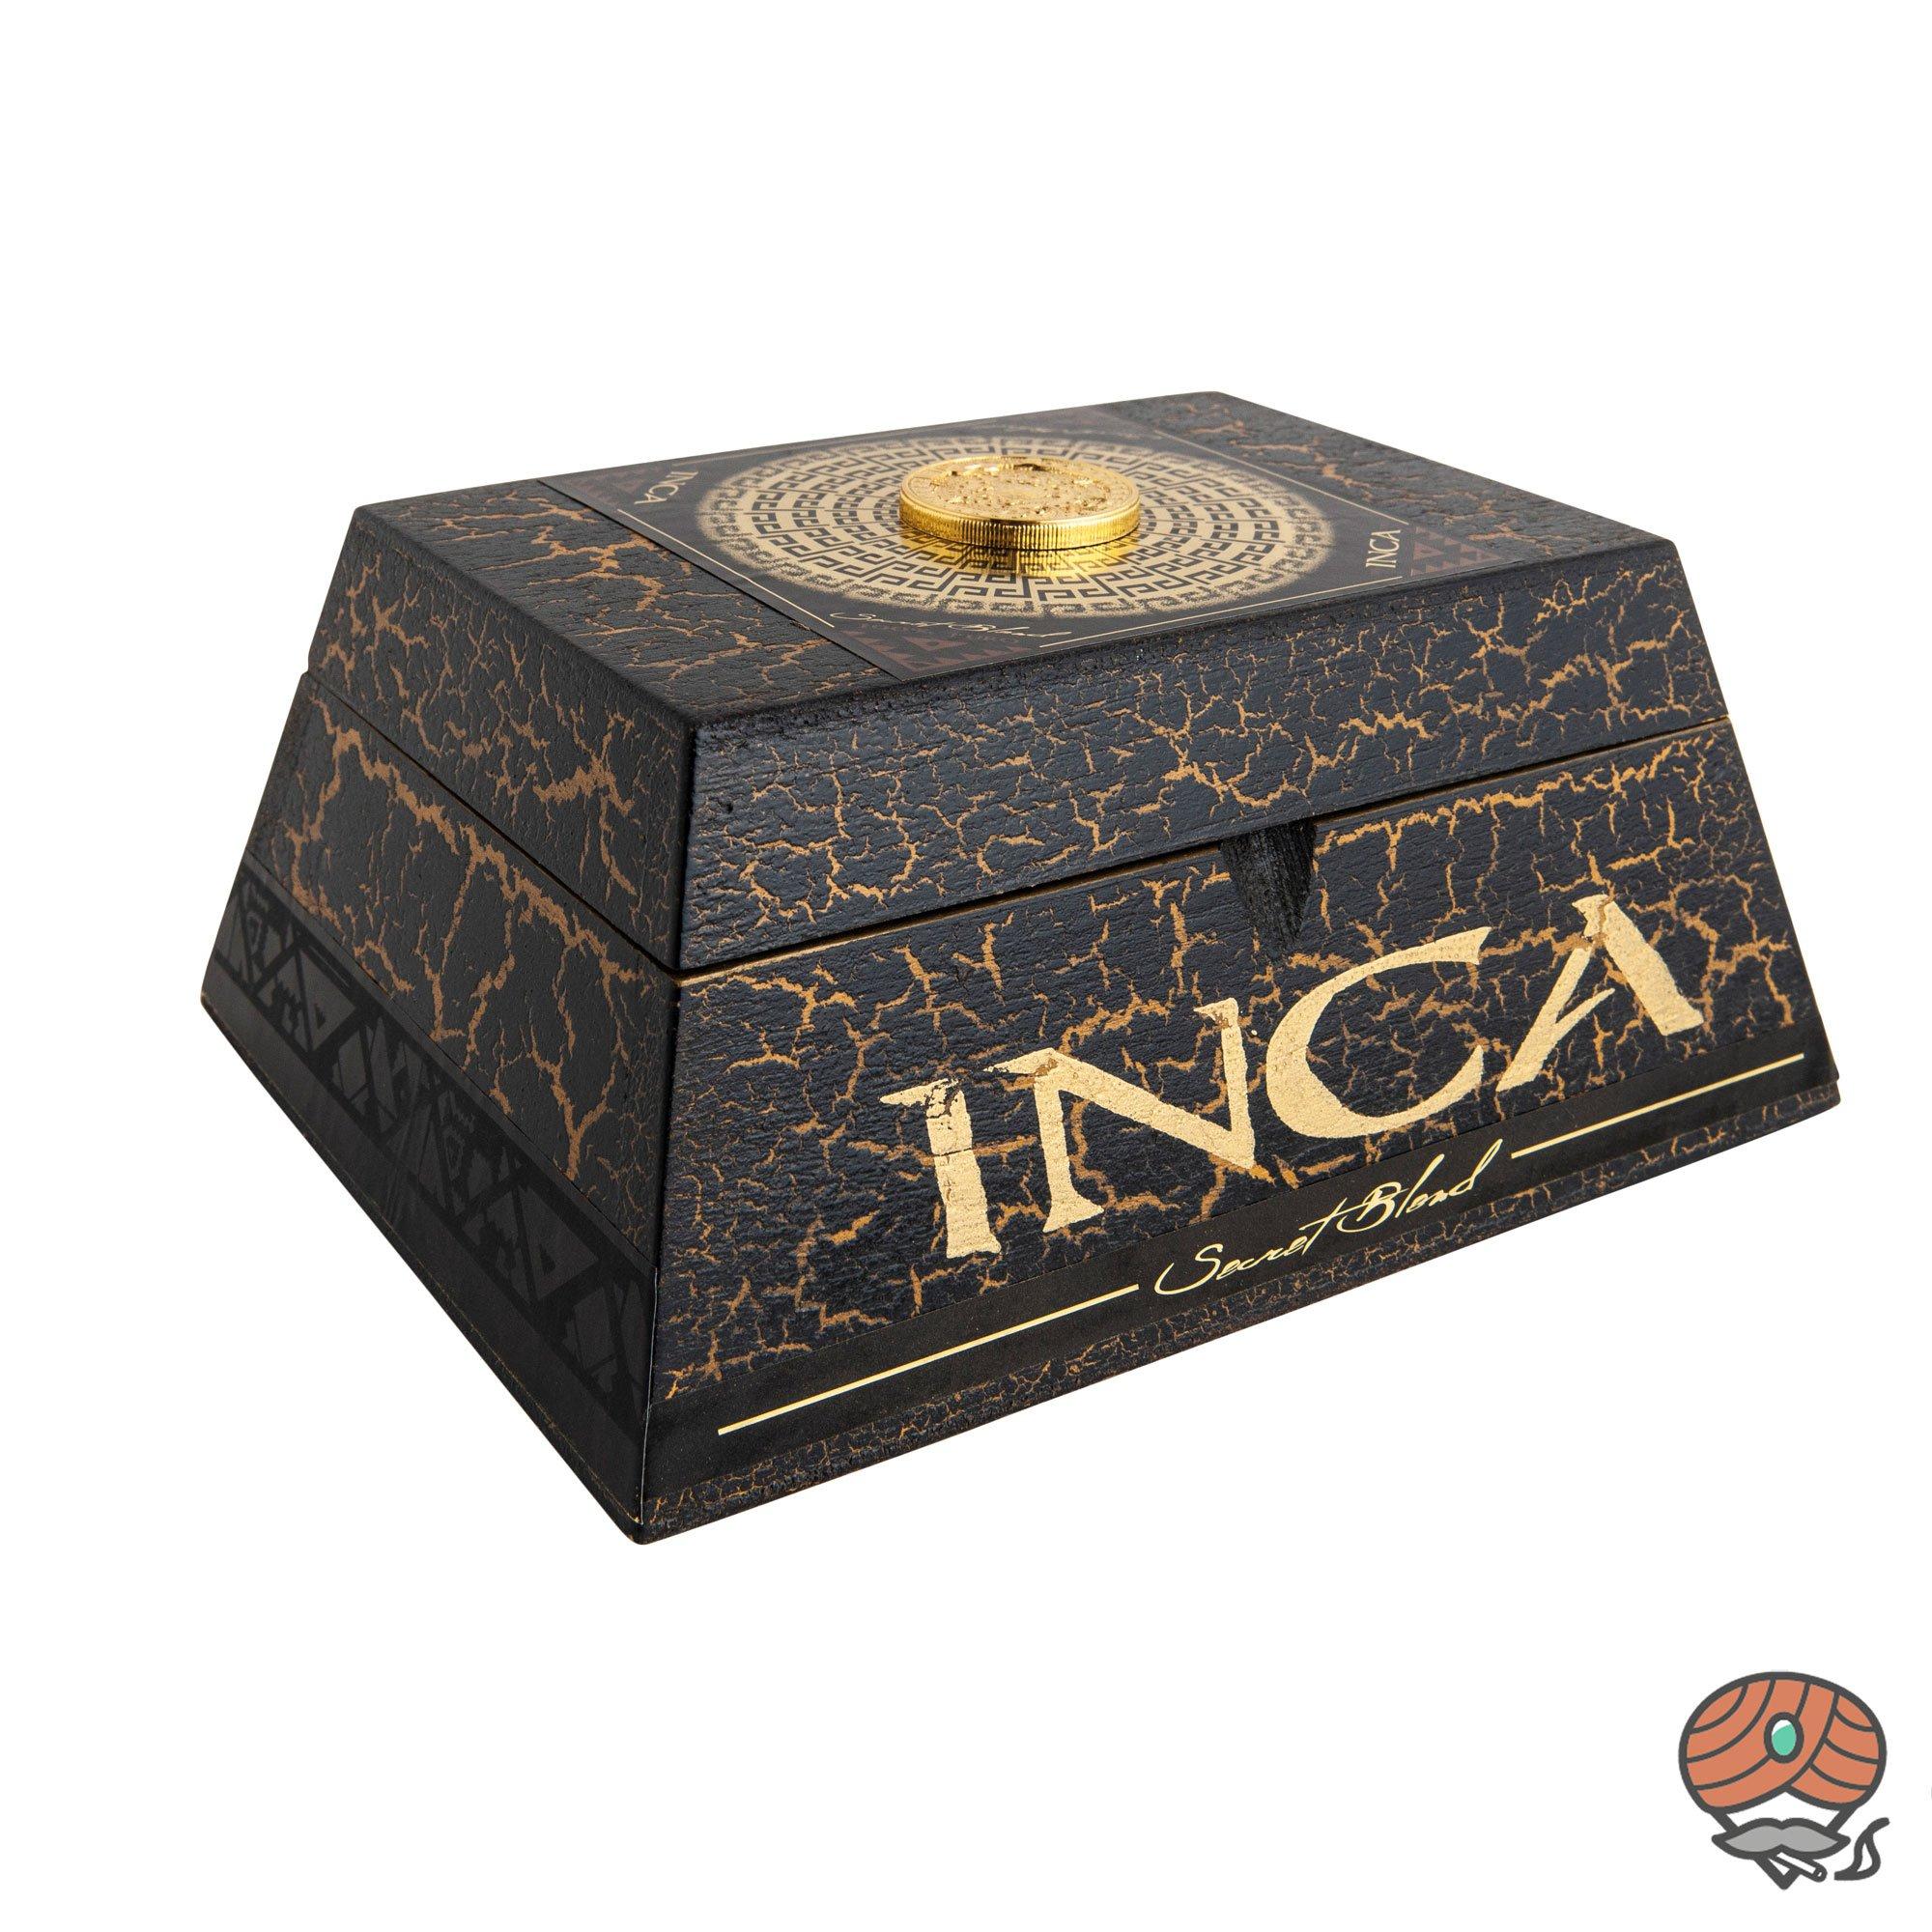 Inca Roca Robusto Zigarren 20er Kiste Peru